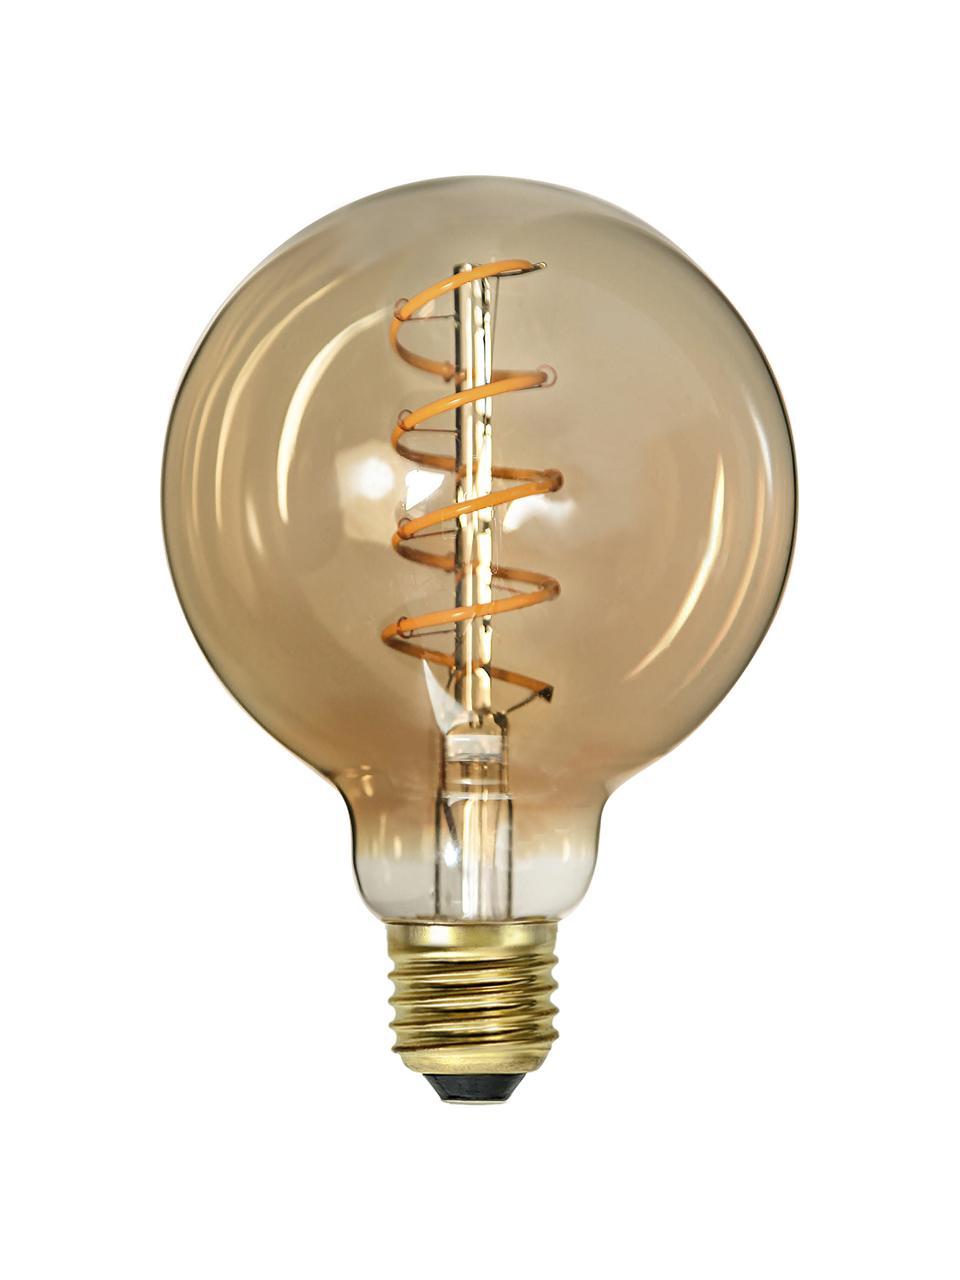 Lampadina E27, 160lm, dimmerabile, bianco caldo, 1 pz, Lampadina: vetro, Ambra trasparente, Ø 10 x Alt. 14 cm